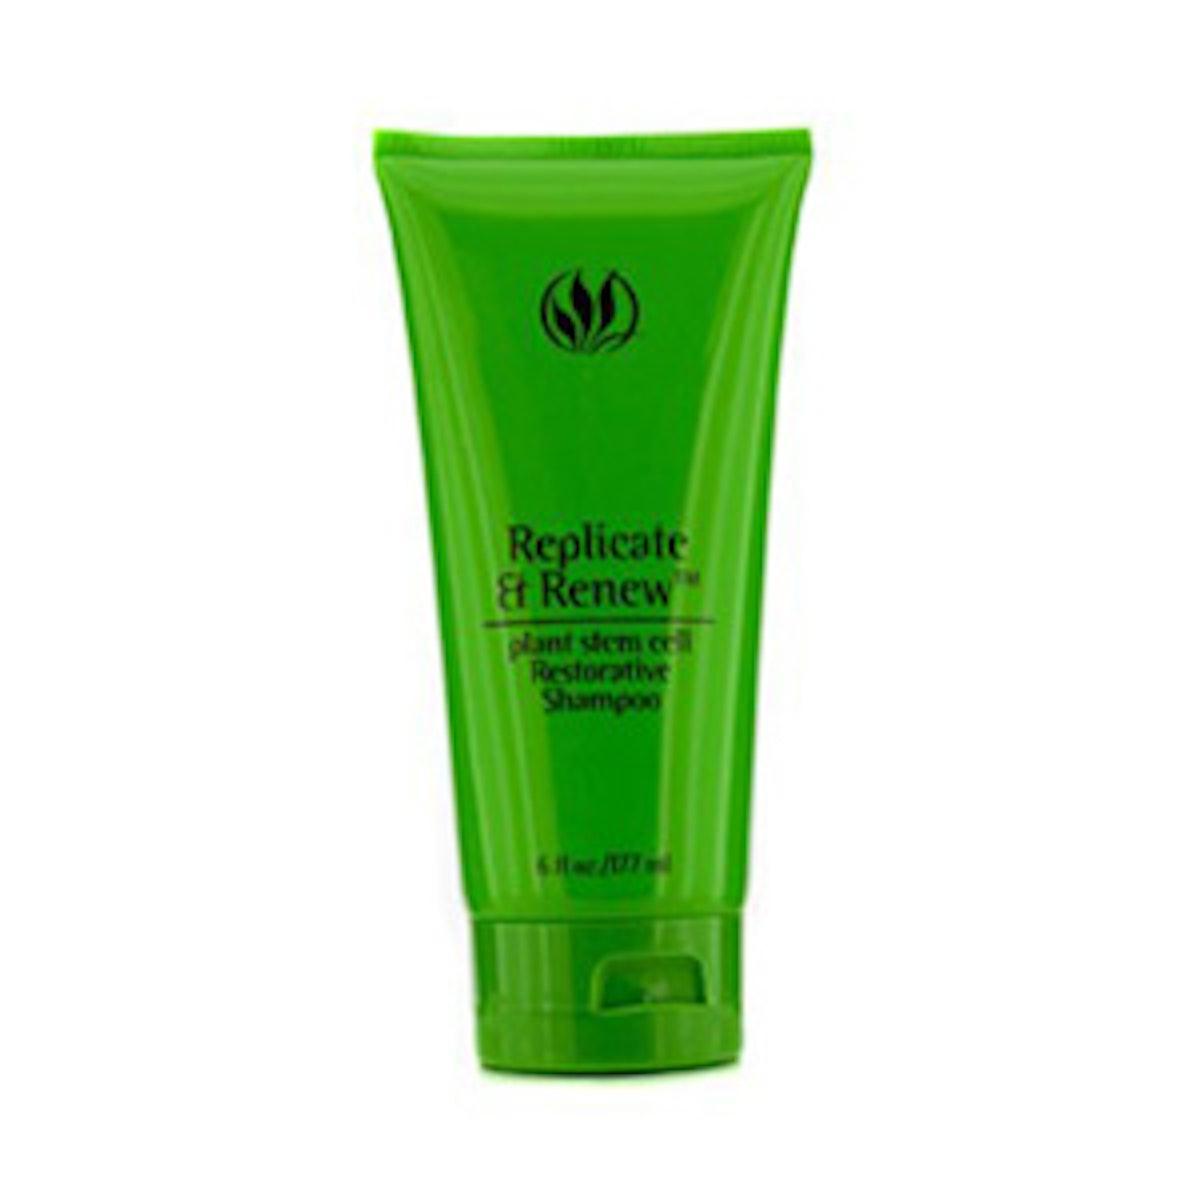 Replicate & Renew Shampoo